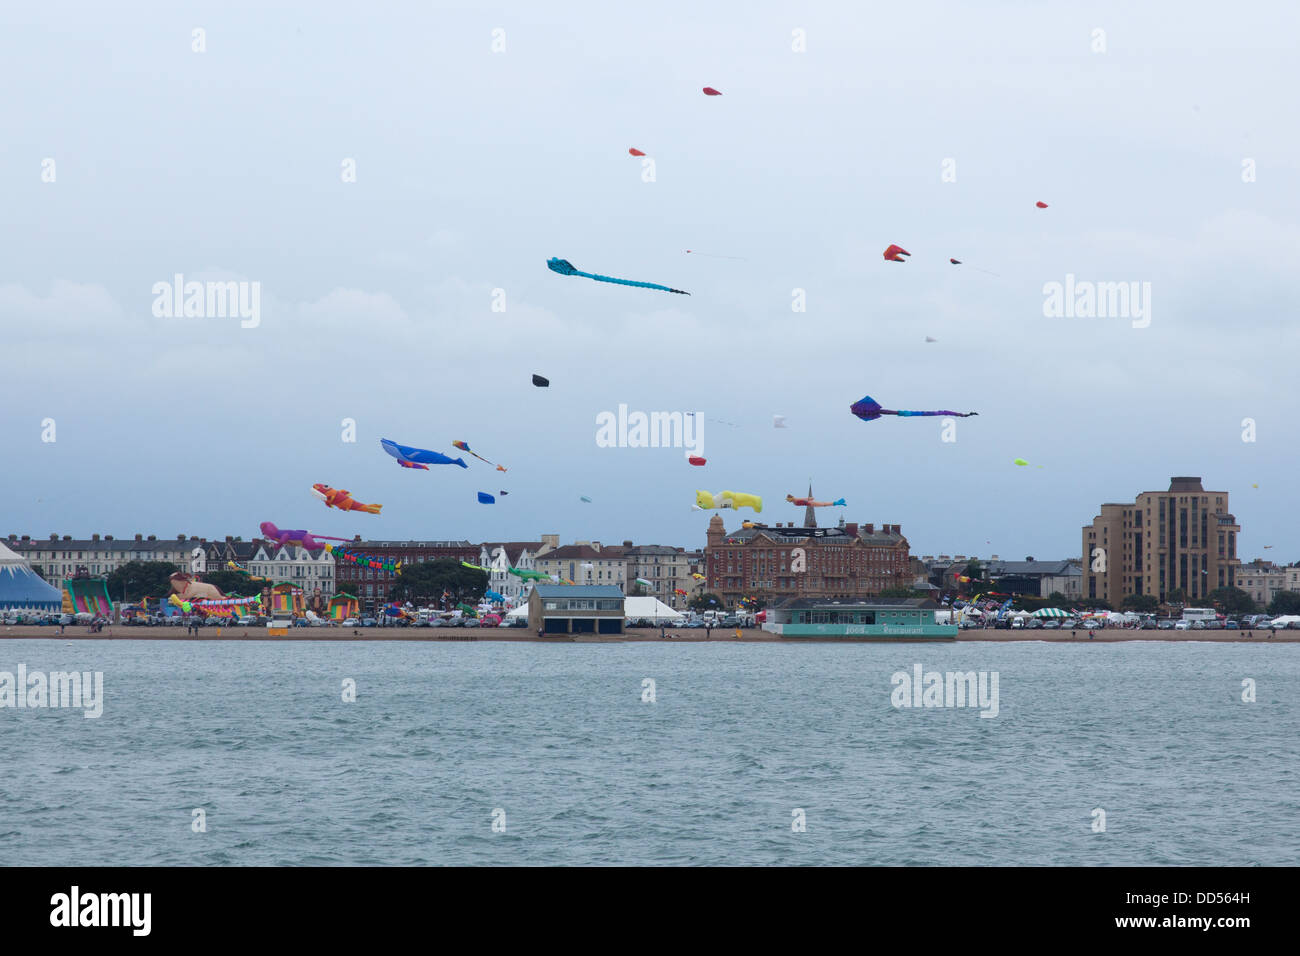 Portsmouth International Kite Festival, Southsea Common,Clarence Esplanade,Southsea,Portsmouth,England, U.K Stock Photo